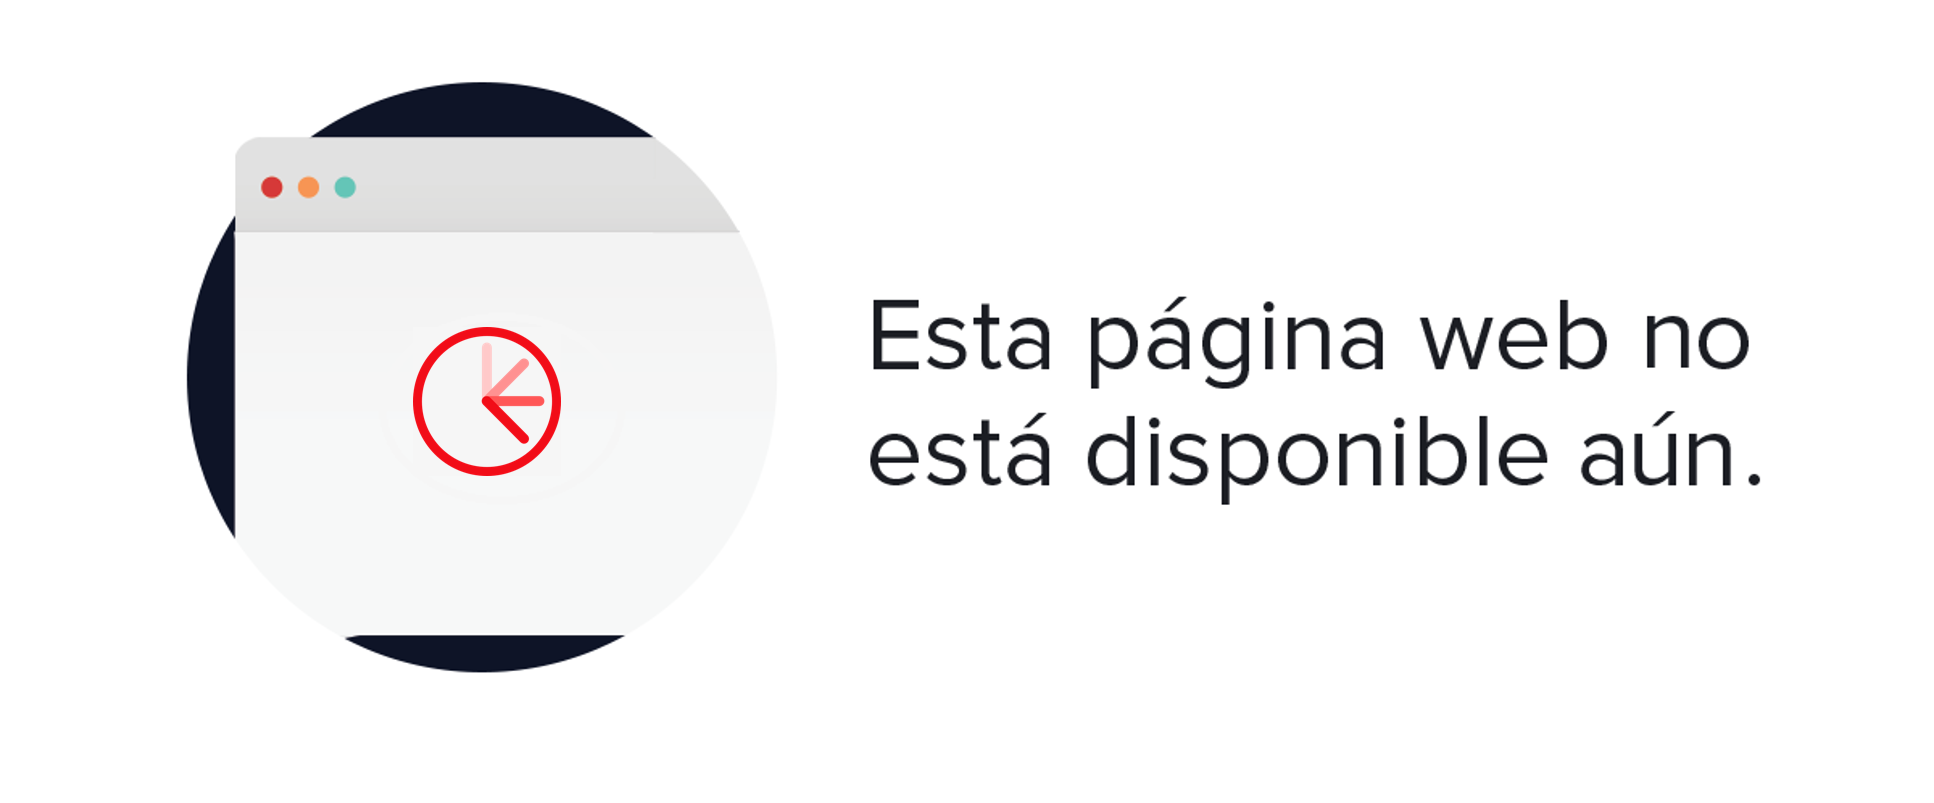 Paruno - Bota de agujetas - Café - P228773 - NUNIUTJ Botas Hombre